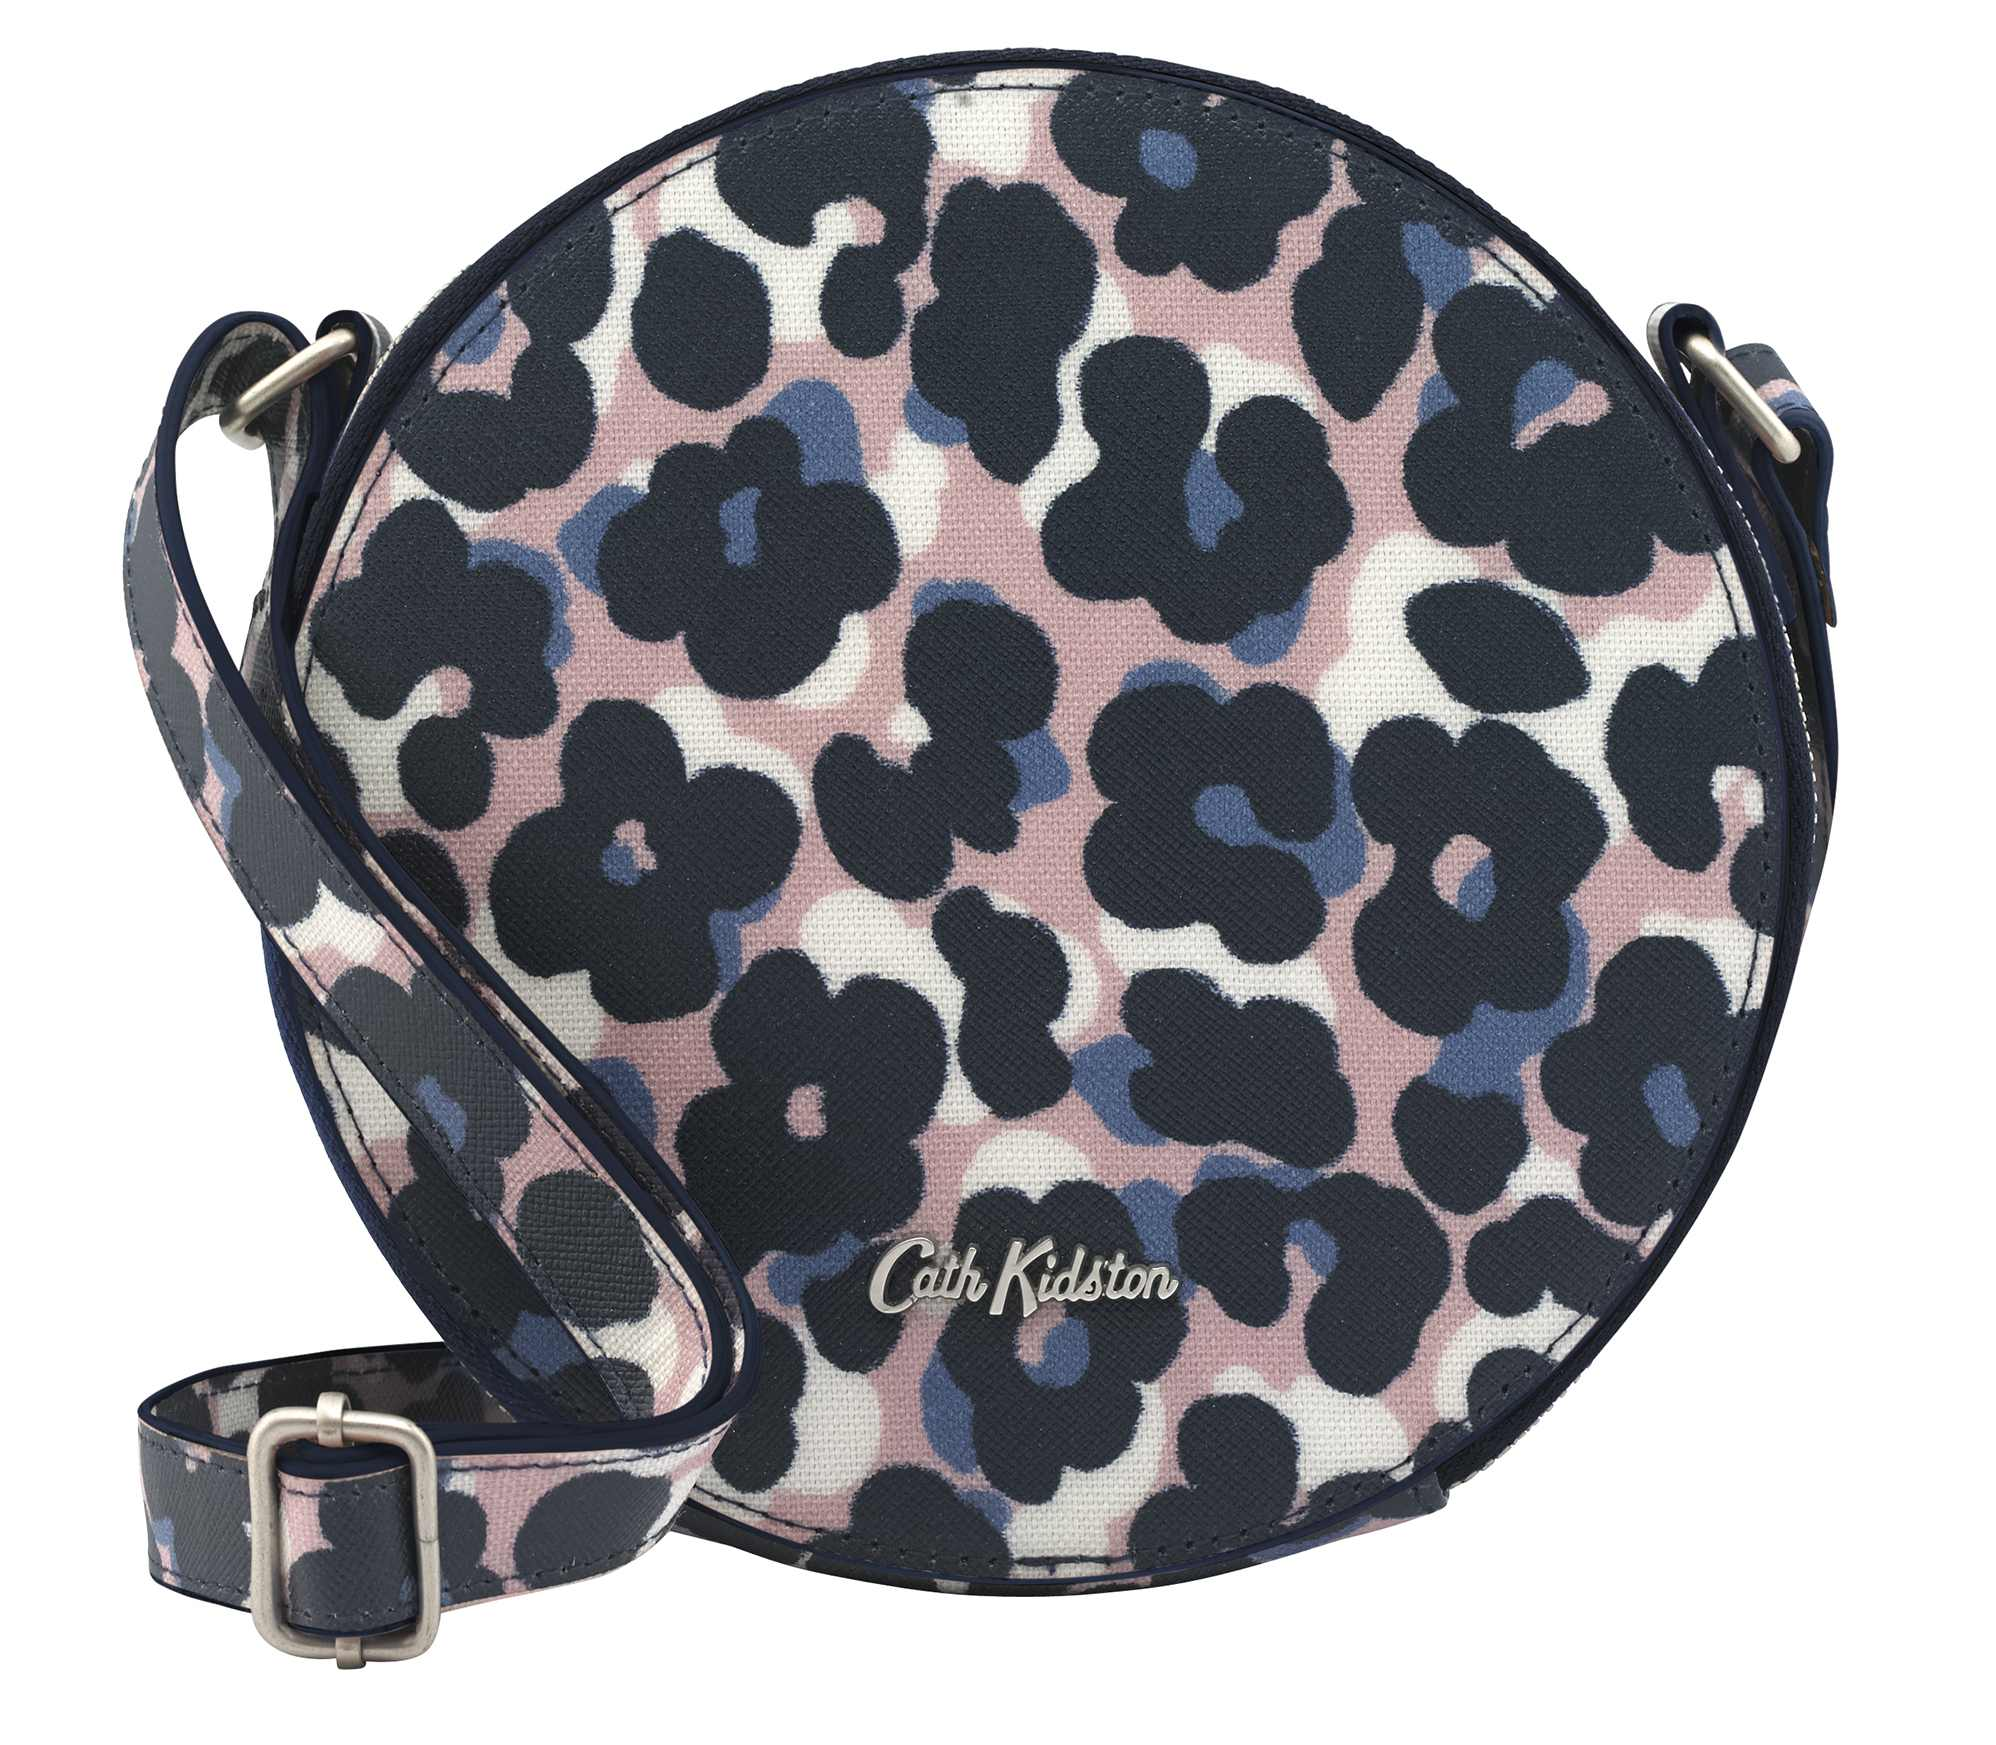 Cath Kidston Leopard Flower Round Cross Body Bag